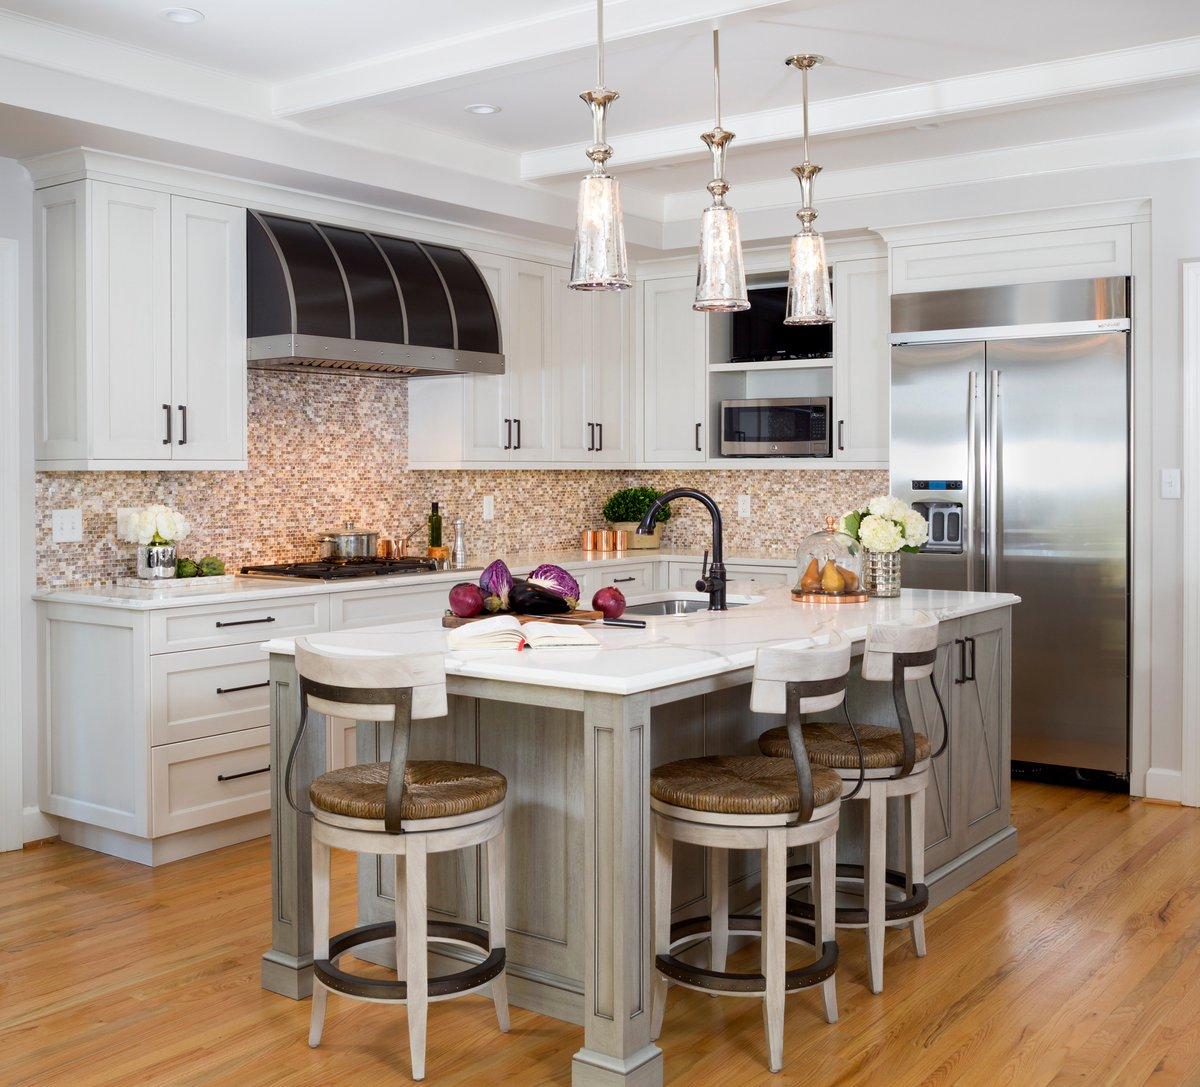 talon kitchen remodeling frederick md 0 replies 0 retweets 1 like